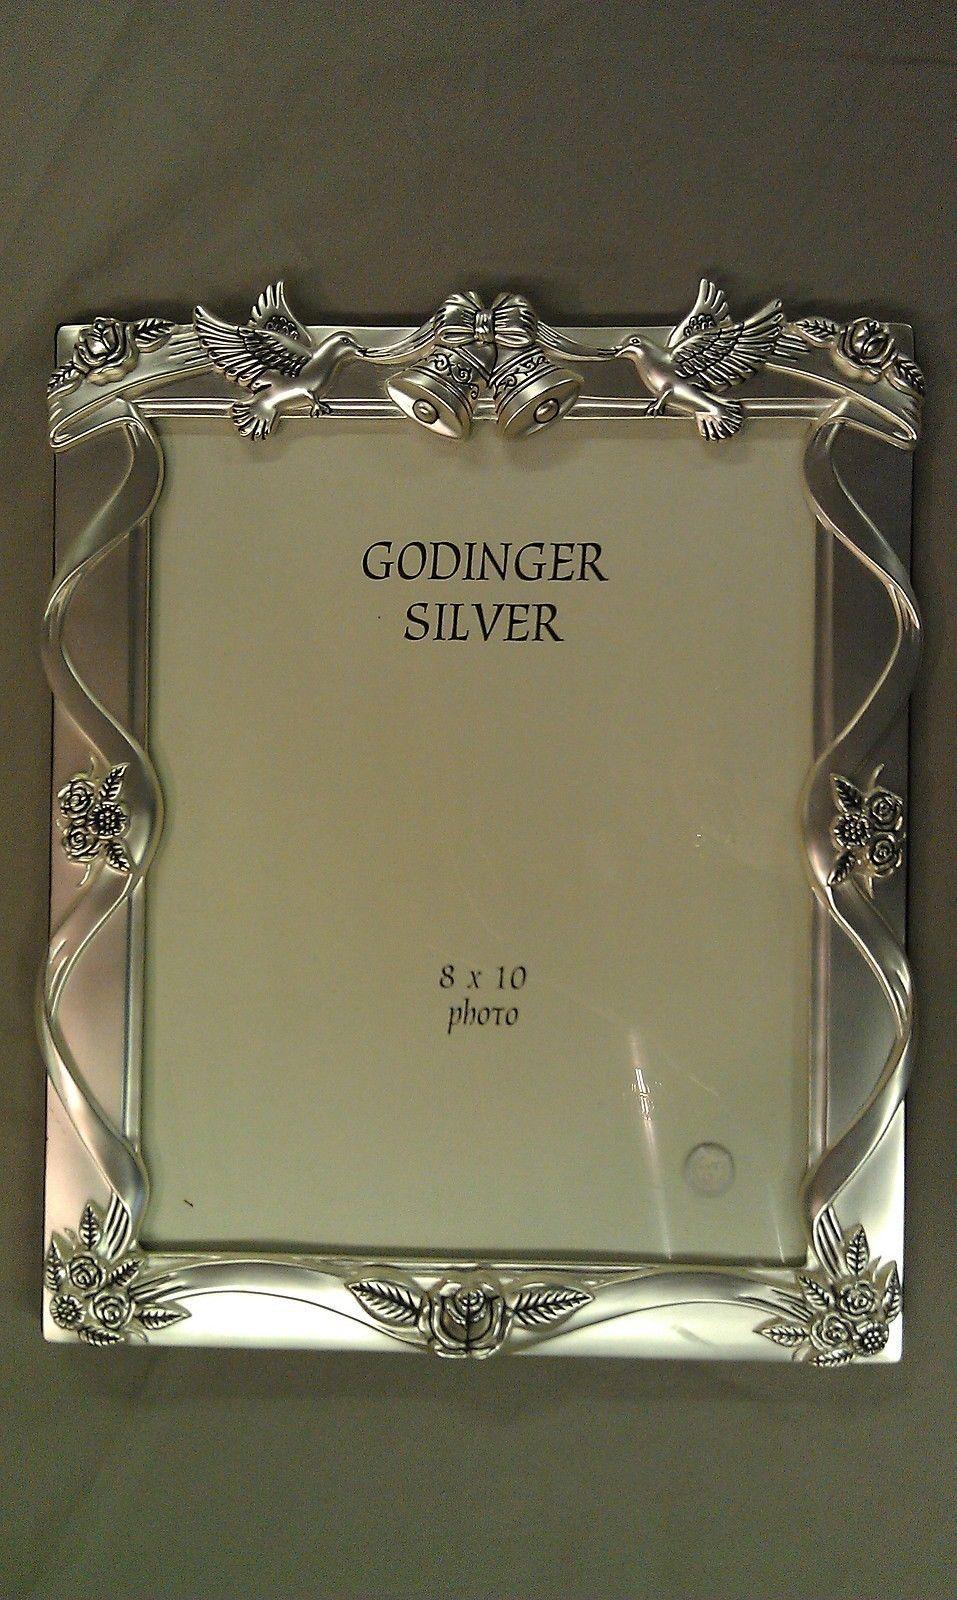 8P76 Godinger Silver Wedding Album Frame and 50 similar items